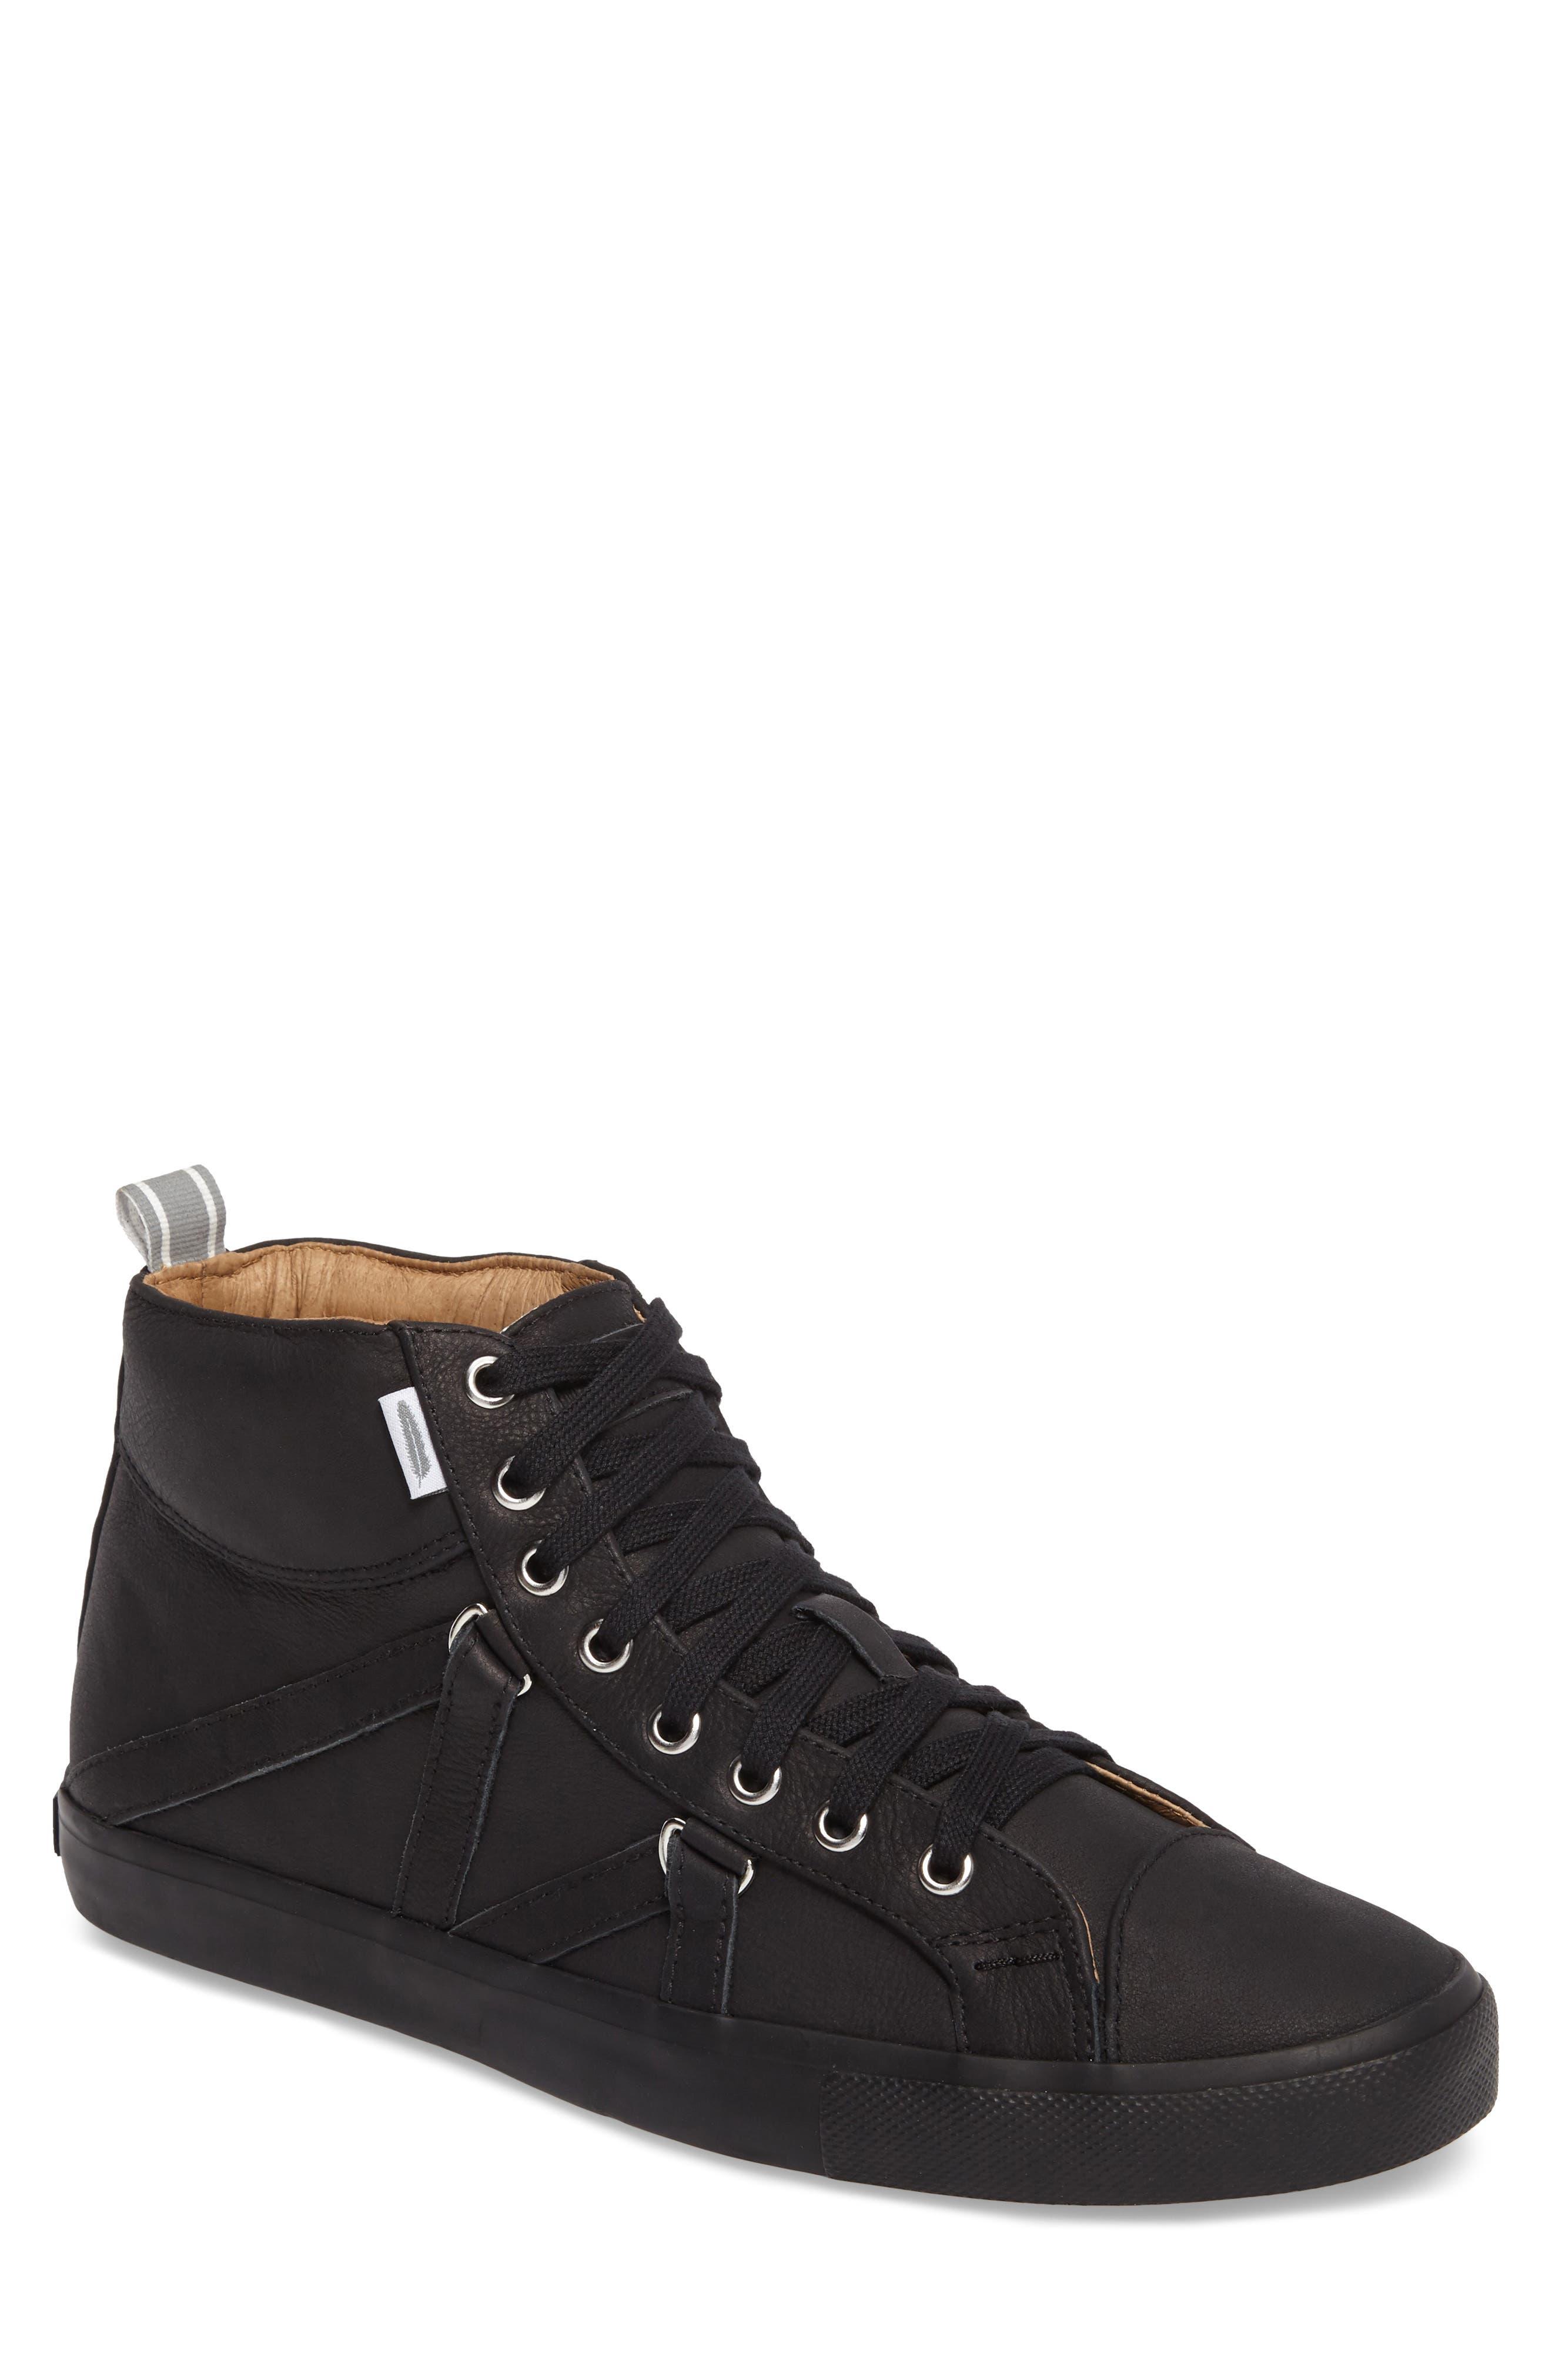 Signature High Top Sneaker,                         Main,                         color, NERO LEATHER